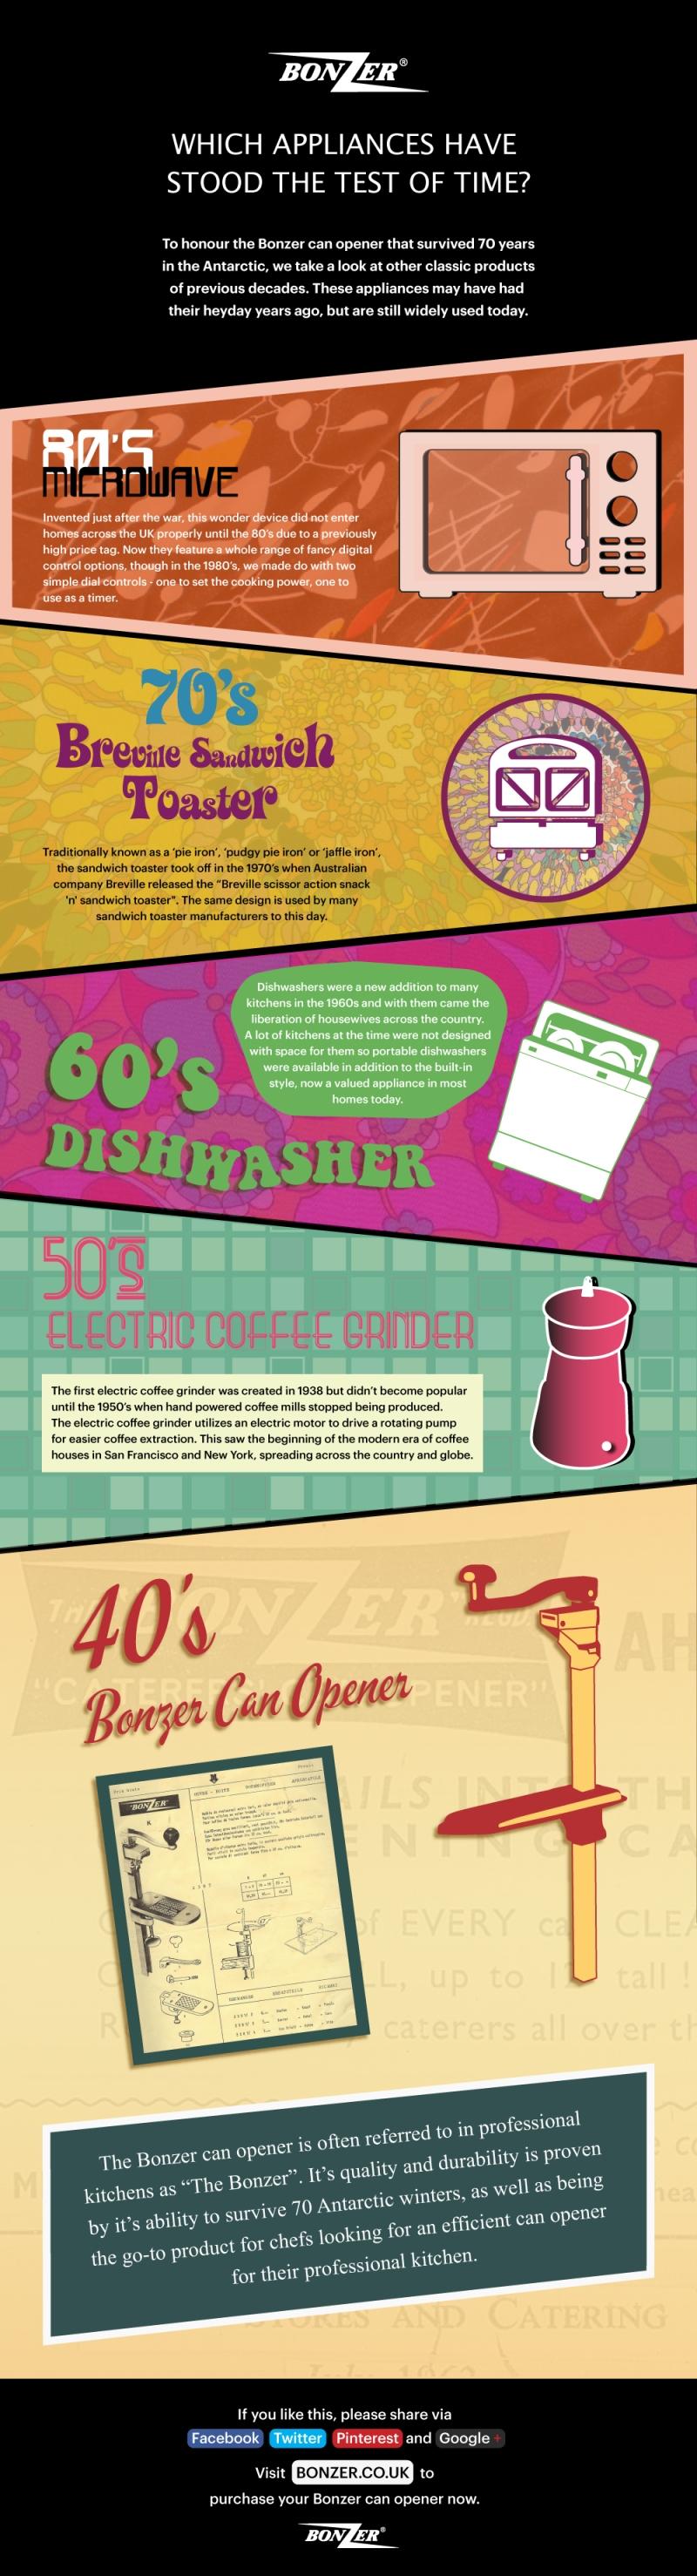 bonzer-can-opener-kitchen-appliances-infographic